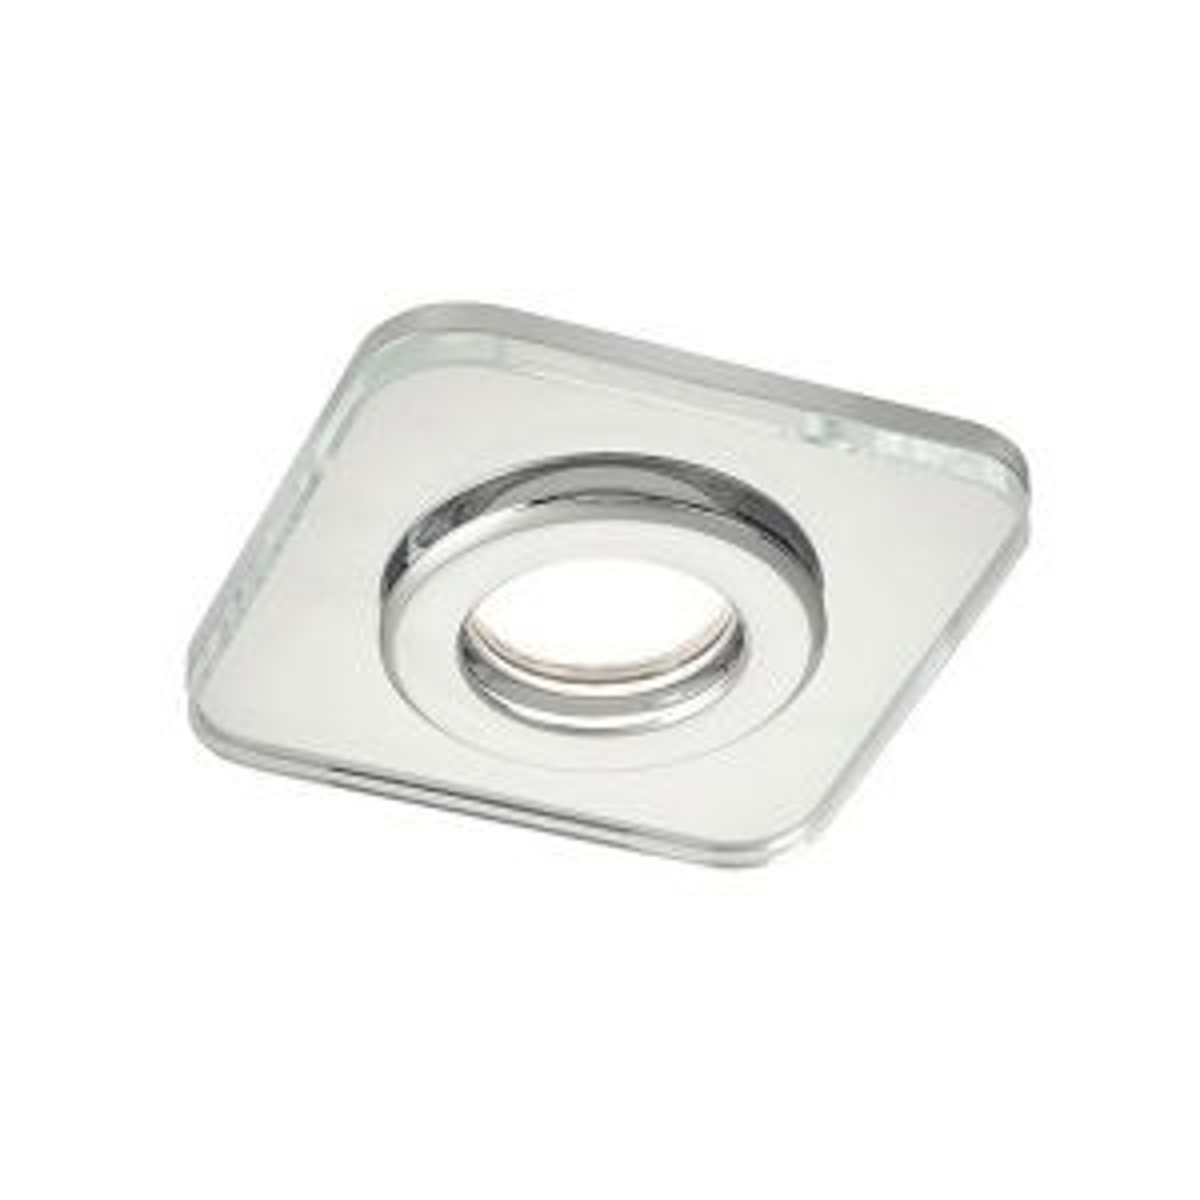 Sensio TrioTone Cube Clear Glass 1